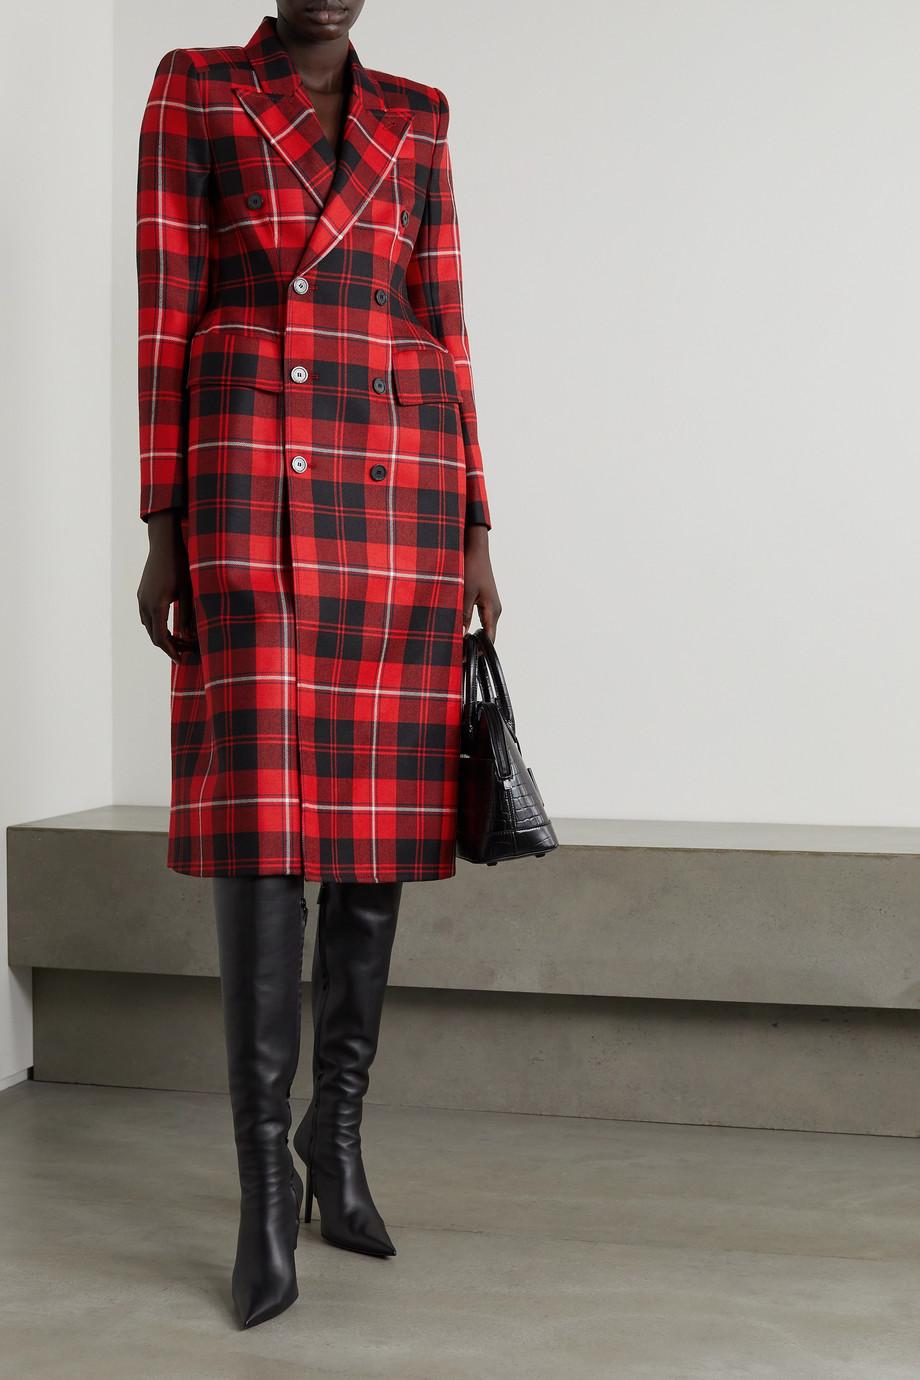 Balenciaga Hourglass doppelreihiger Mantel aus kariertem Woll-Twill